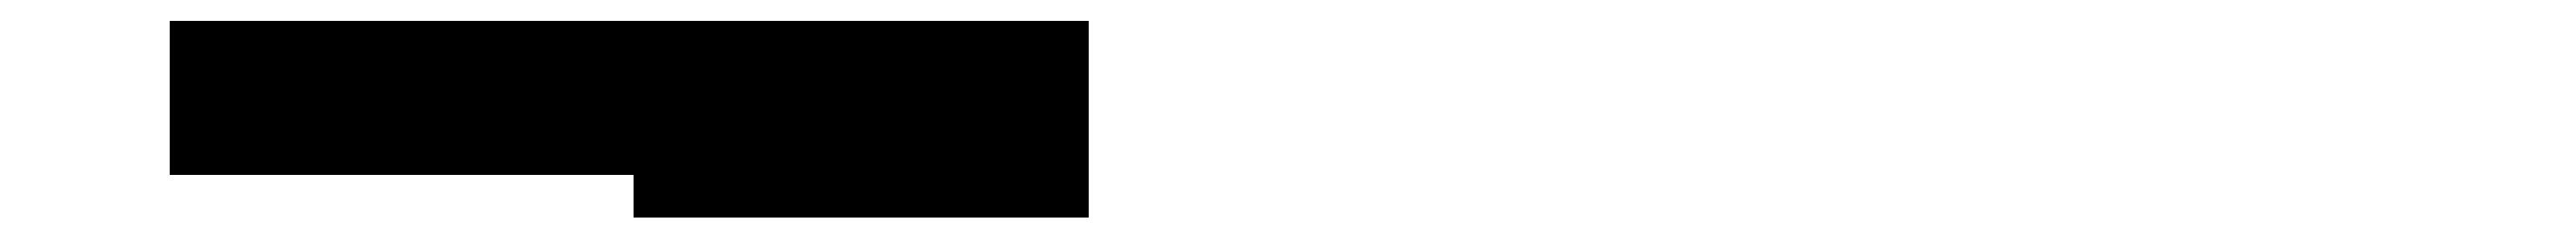 Typeface-Novel-Sans-Hairline-F04-Atlas-Font-Foundry